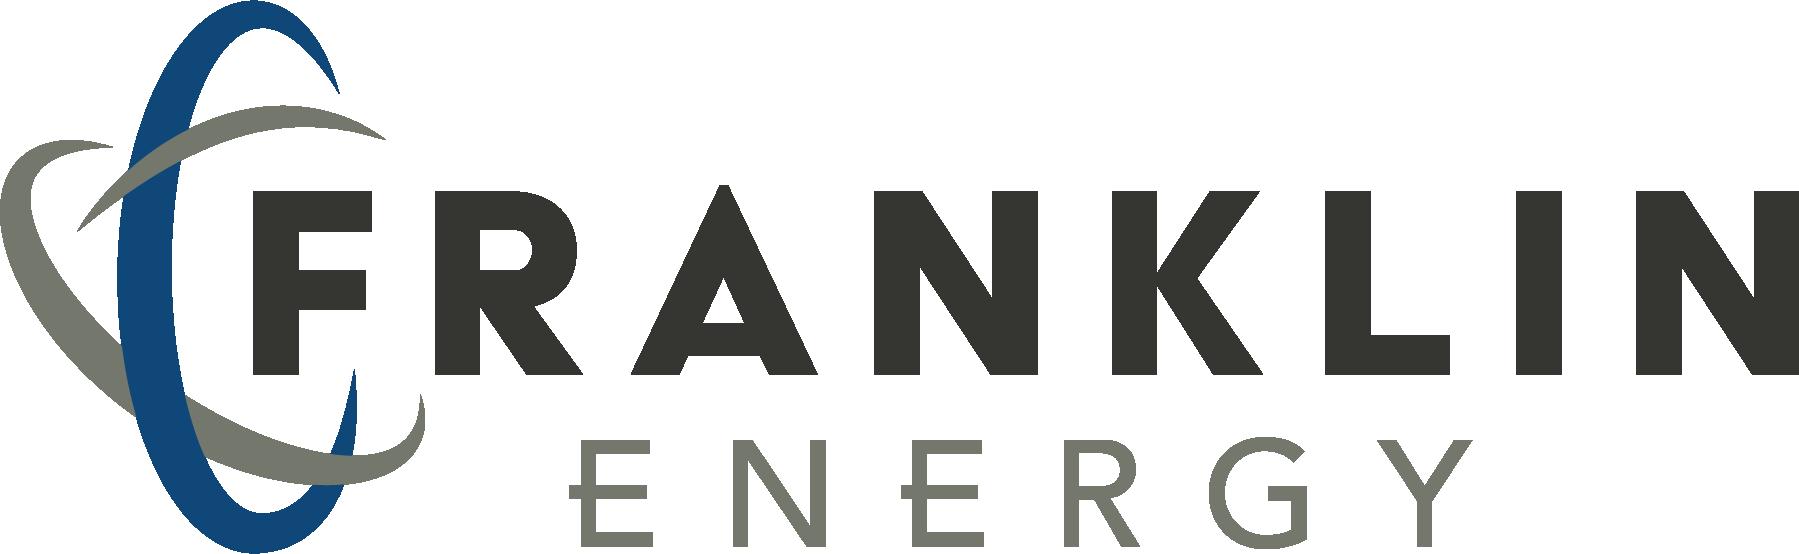 Franklin Energy